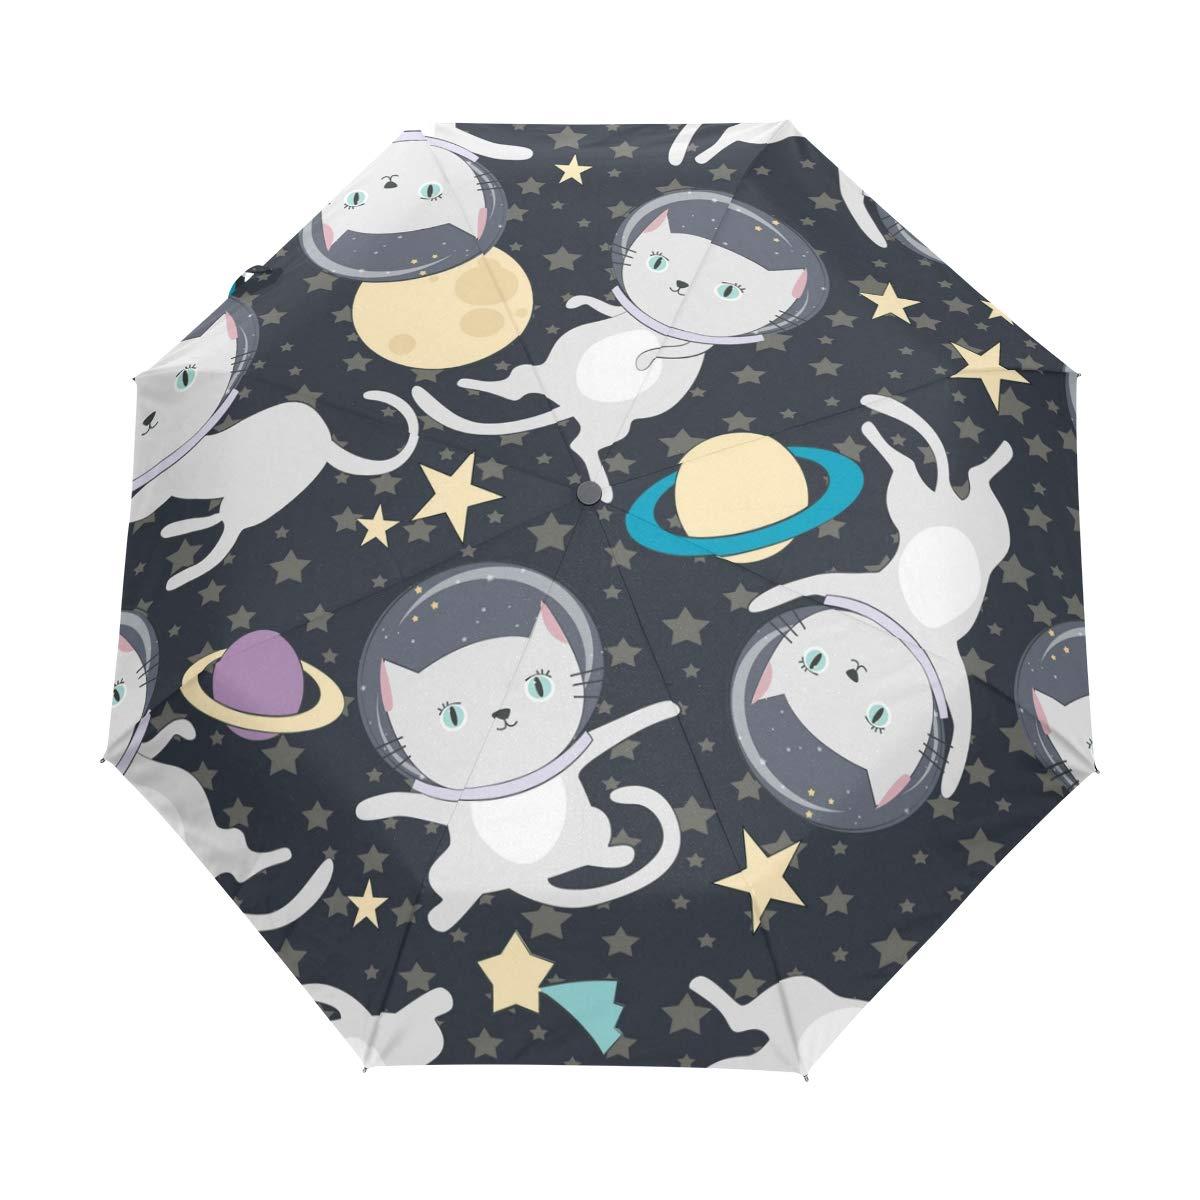 FORMRS 3 Folds Umbrella Fun Cat Astronau Auto Open Close Anti-UV Umbrella by FORMRS (Image #1)